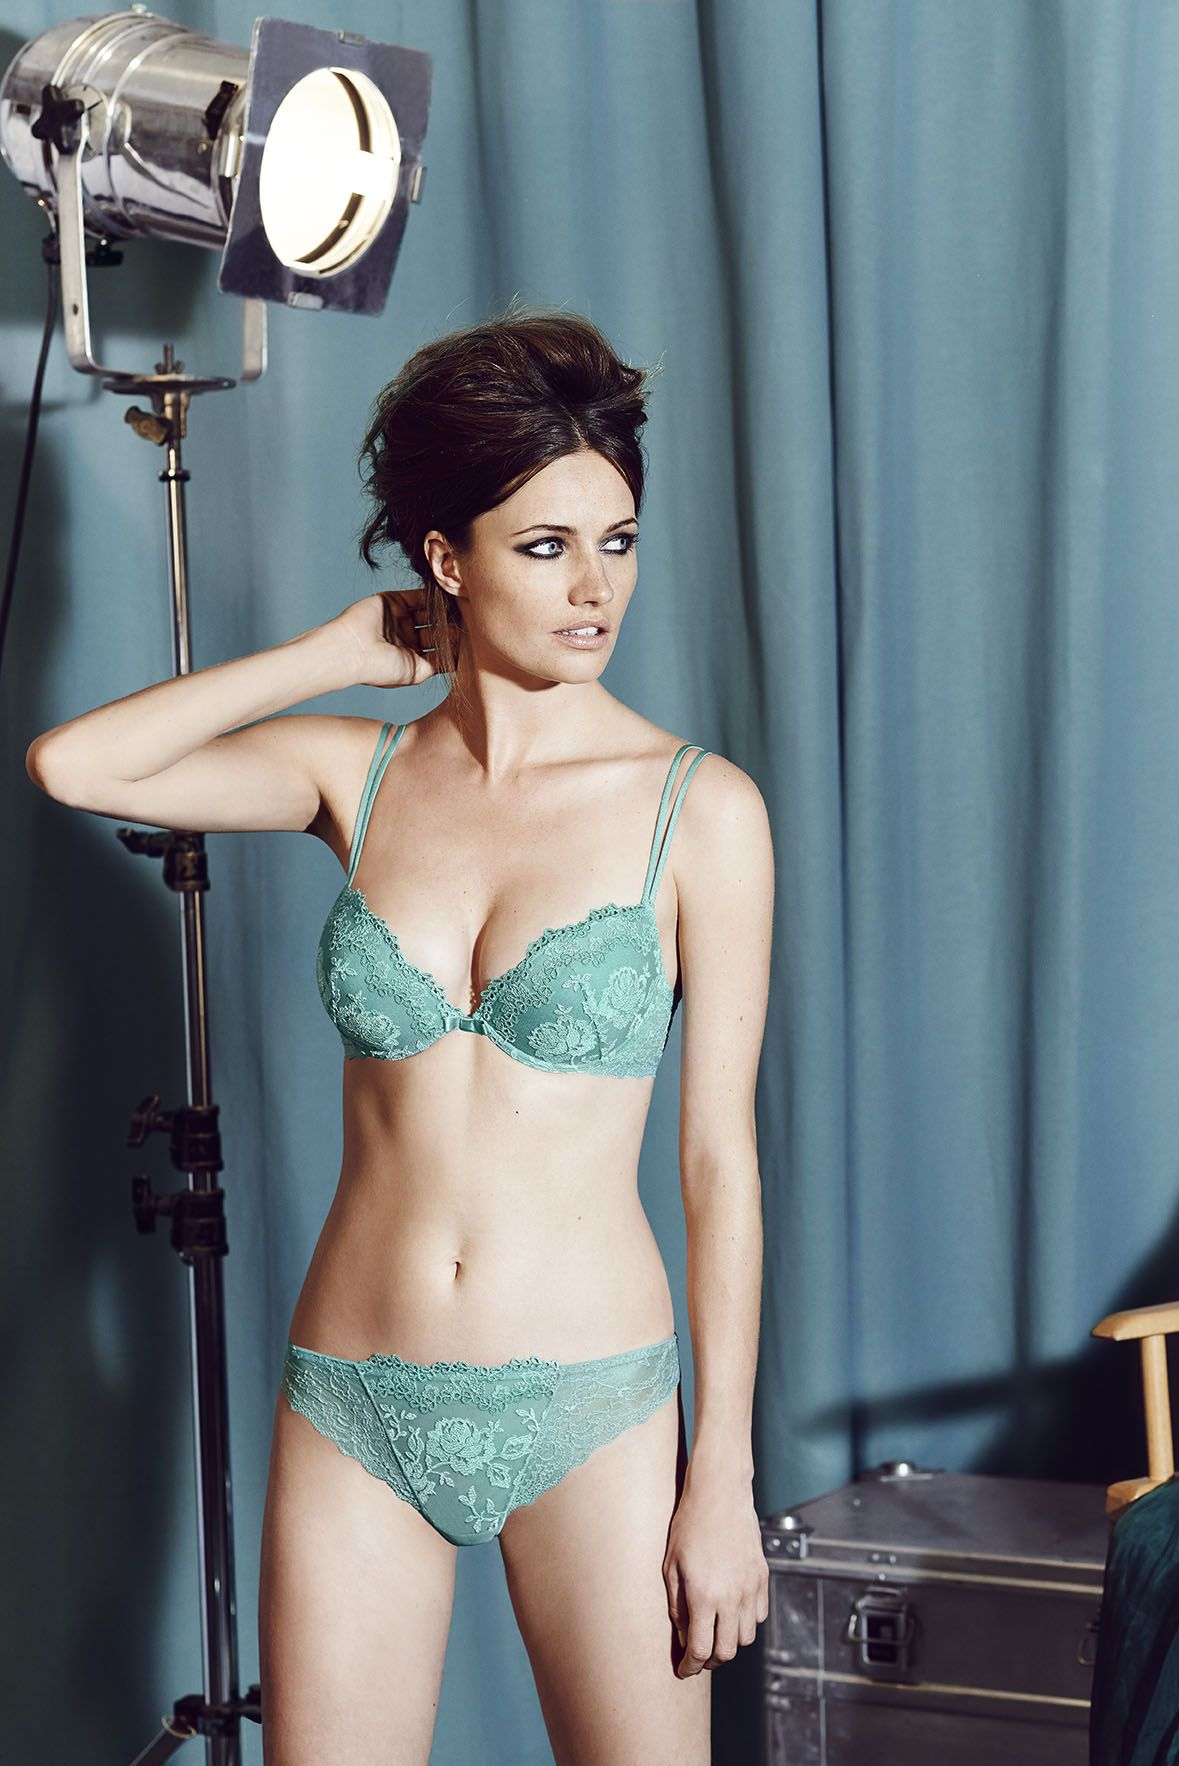 official Lingerie website model